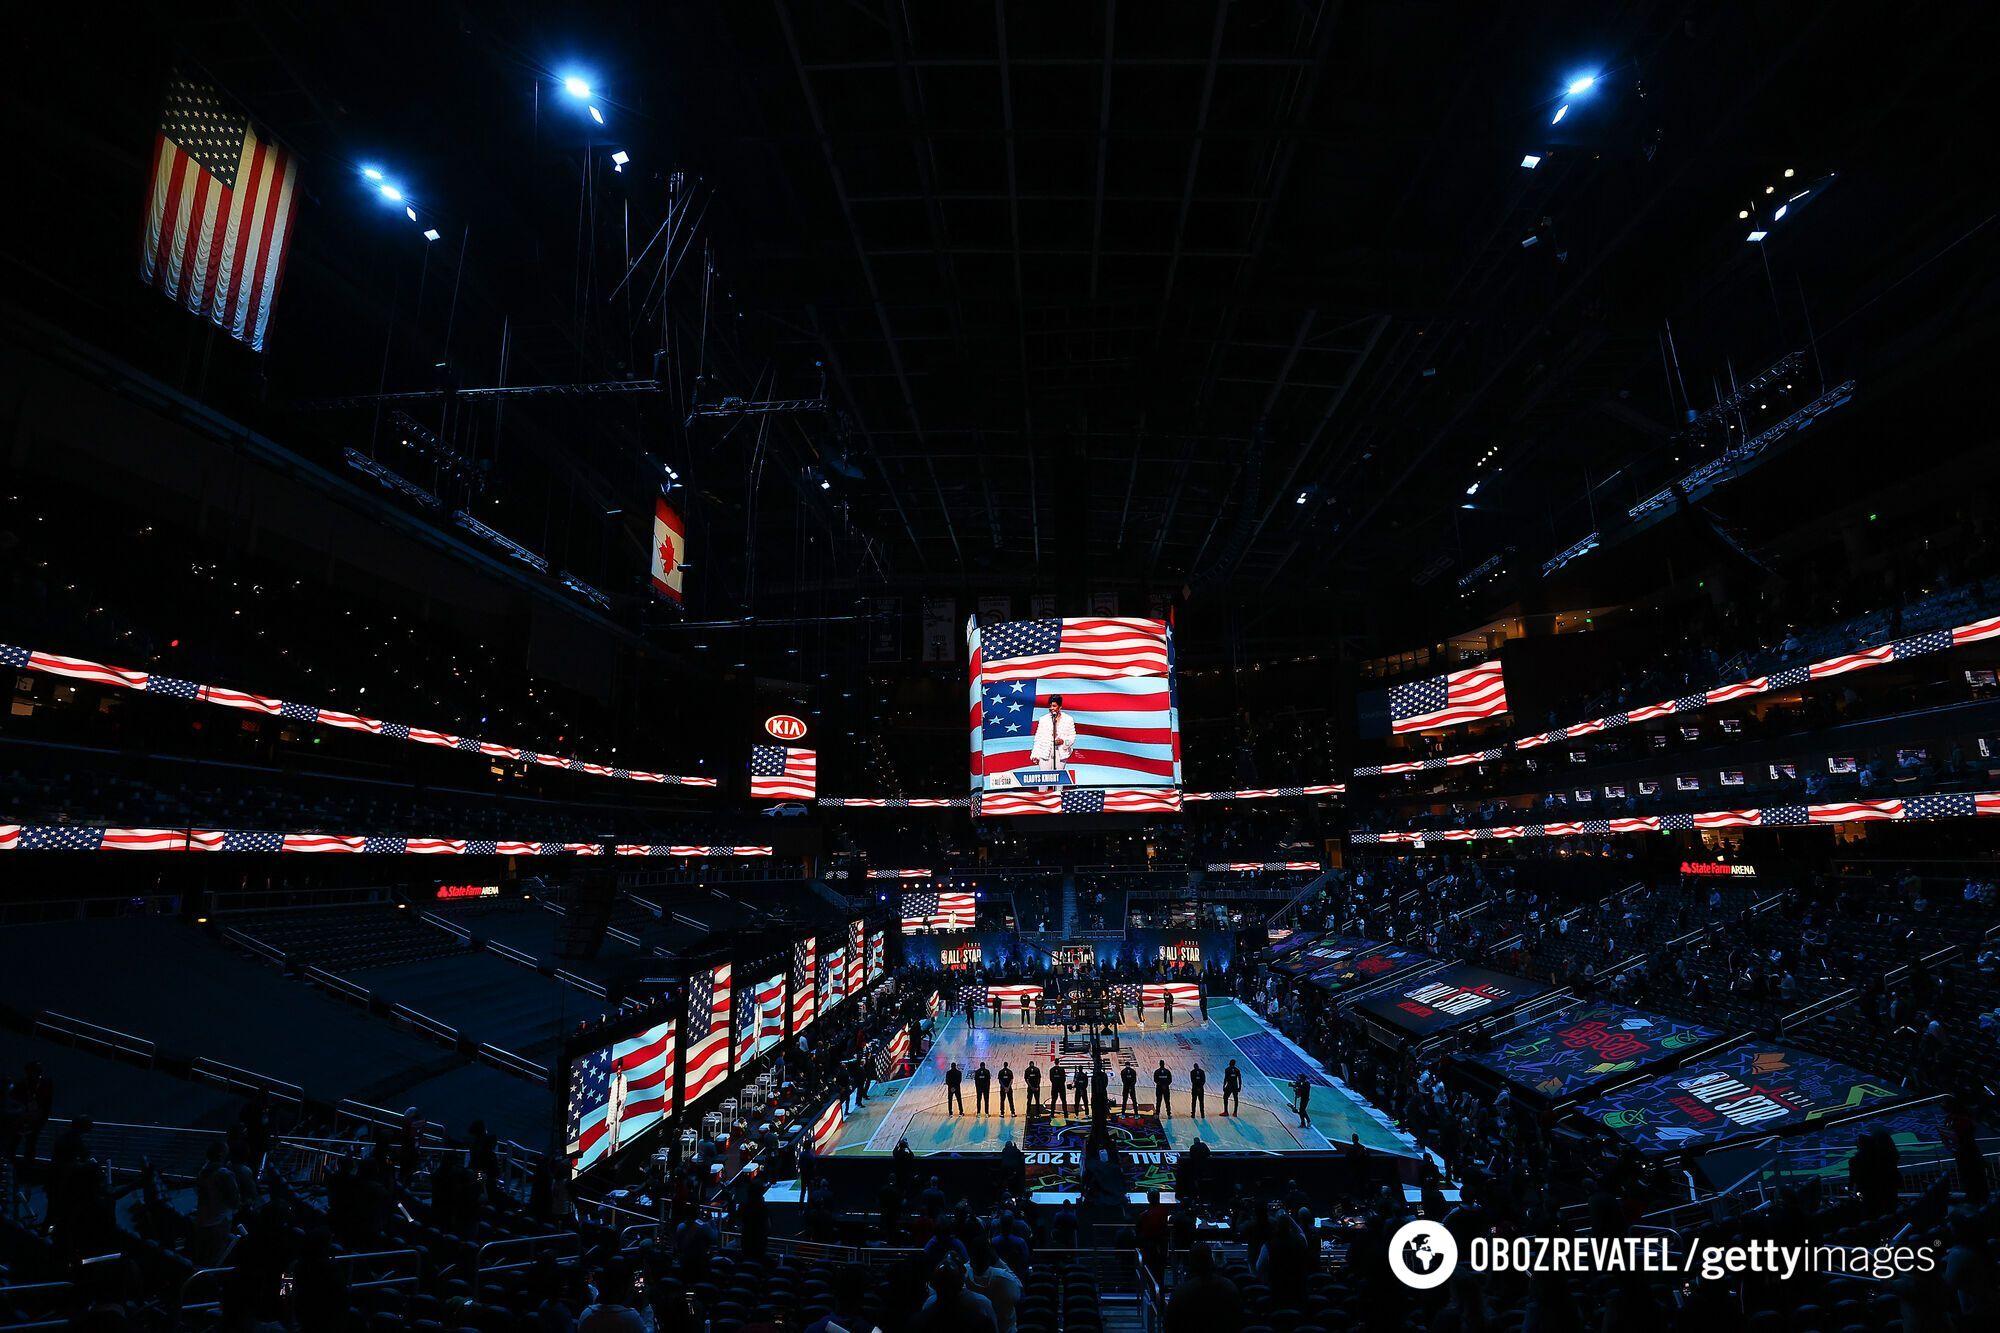 Атмосфера на арене перед матчем